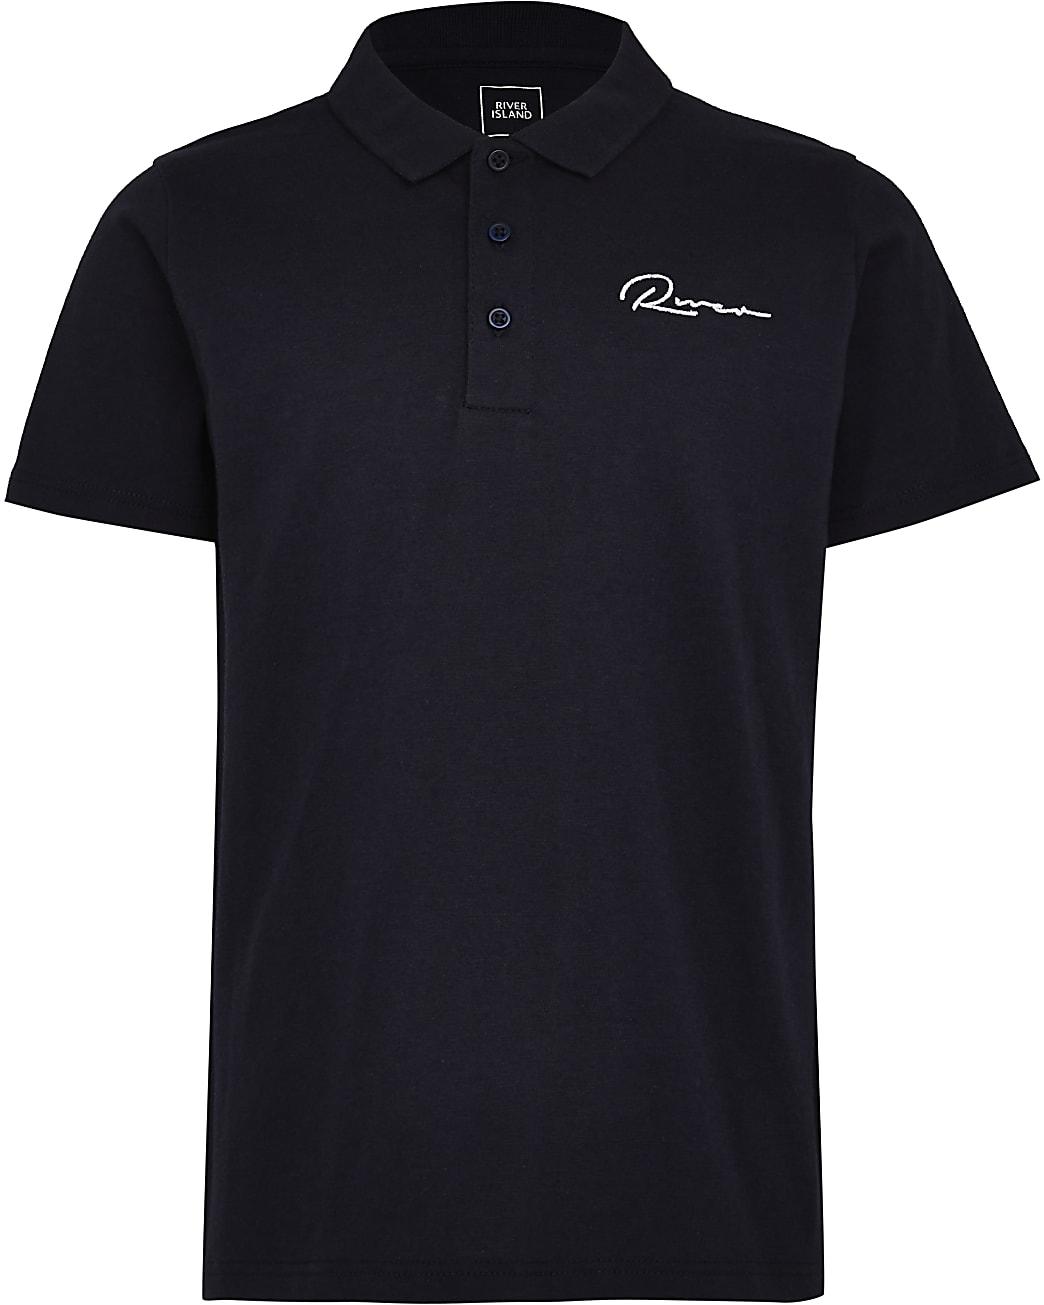 Boys navy River short sleeve polo shirt